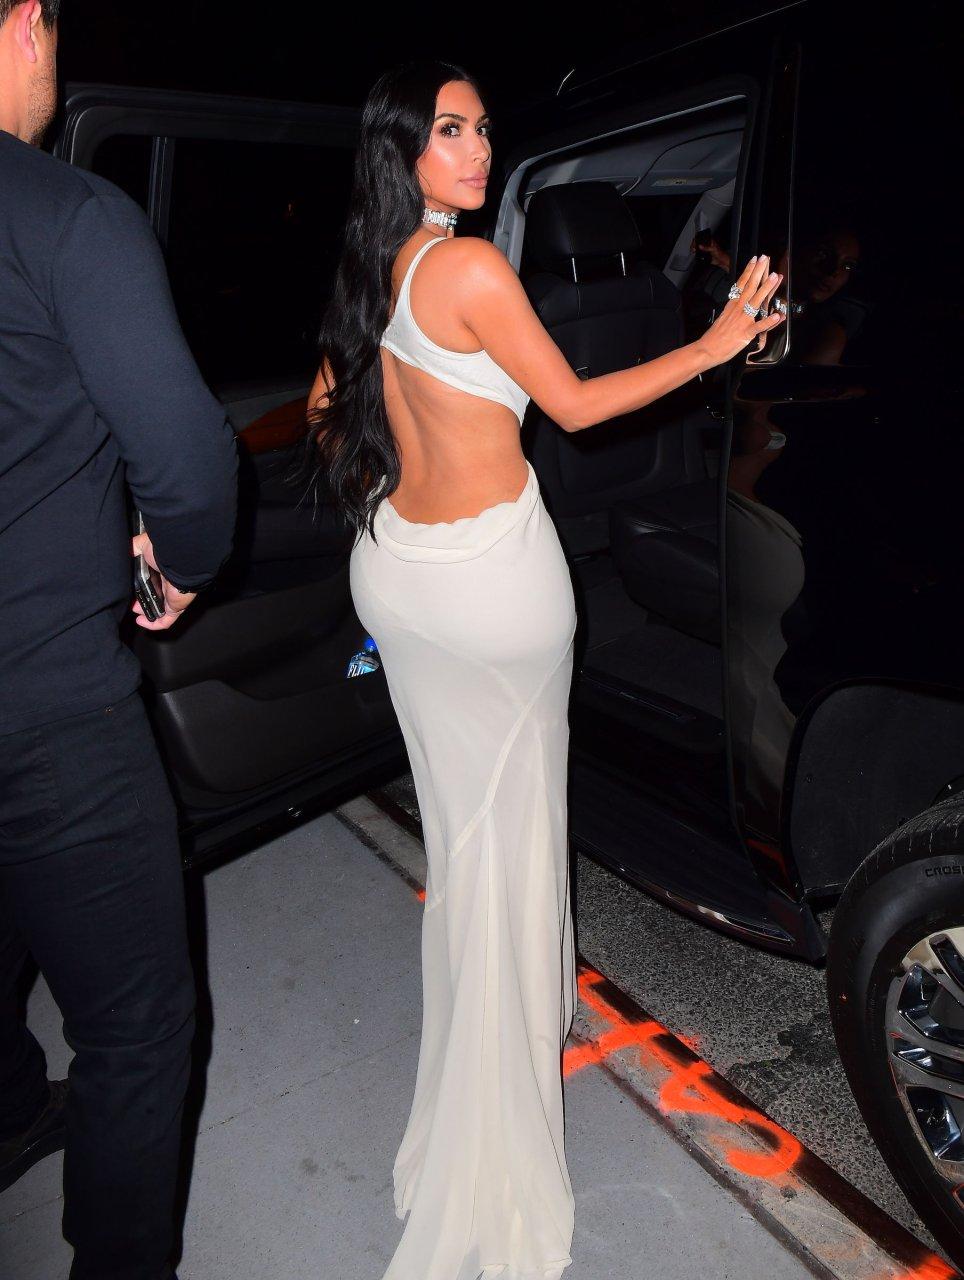 Kim-Kardashian-Sexy-TheFappeningBlog.com-40.jpg